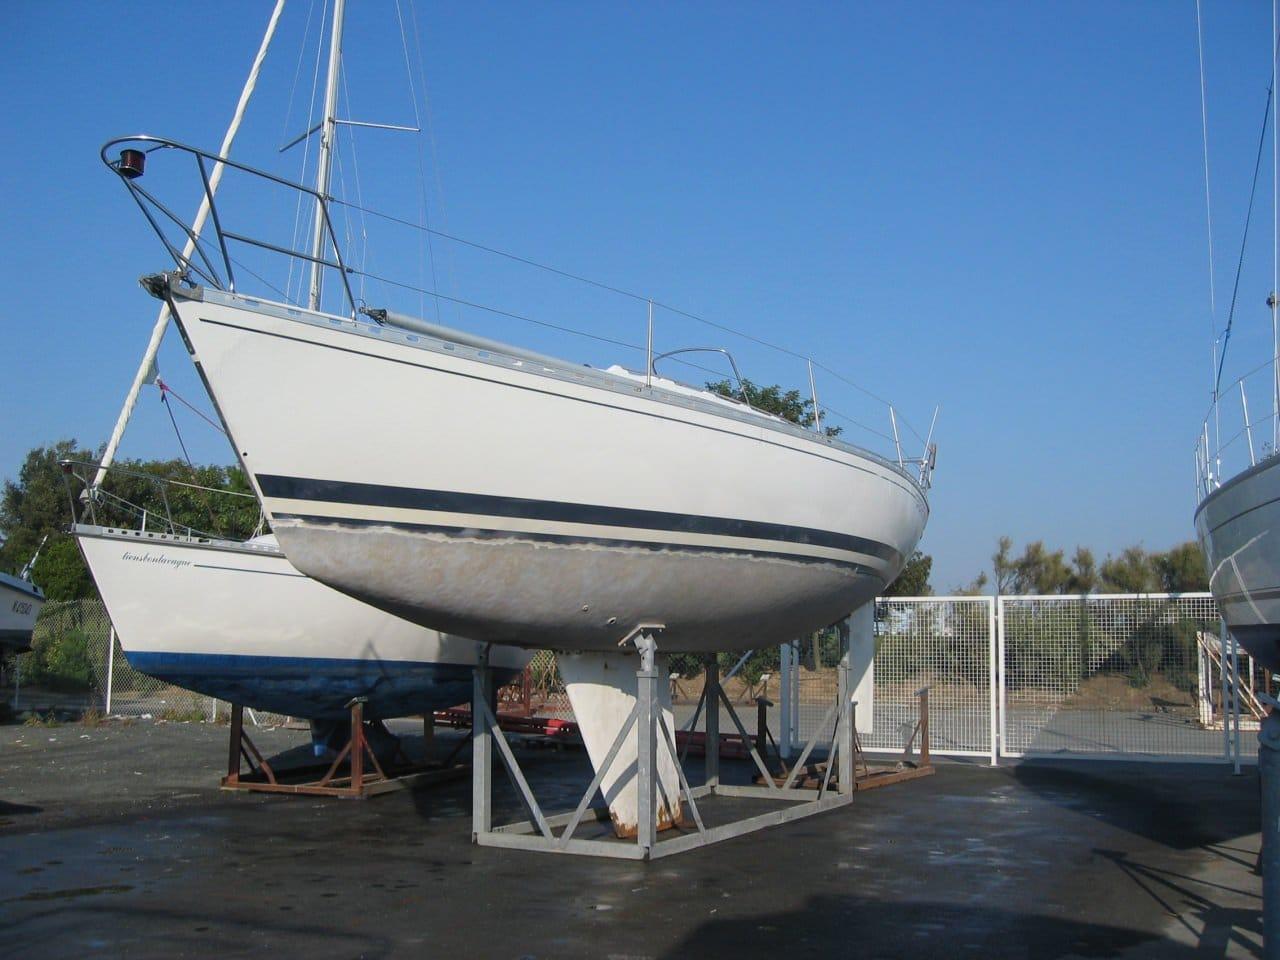 hydrogommage de bateau decapage gelcoat piscine